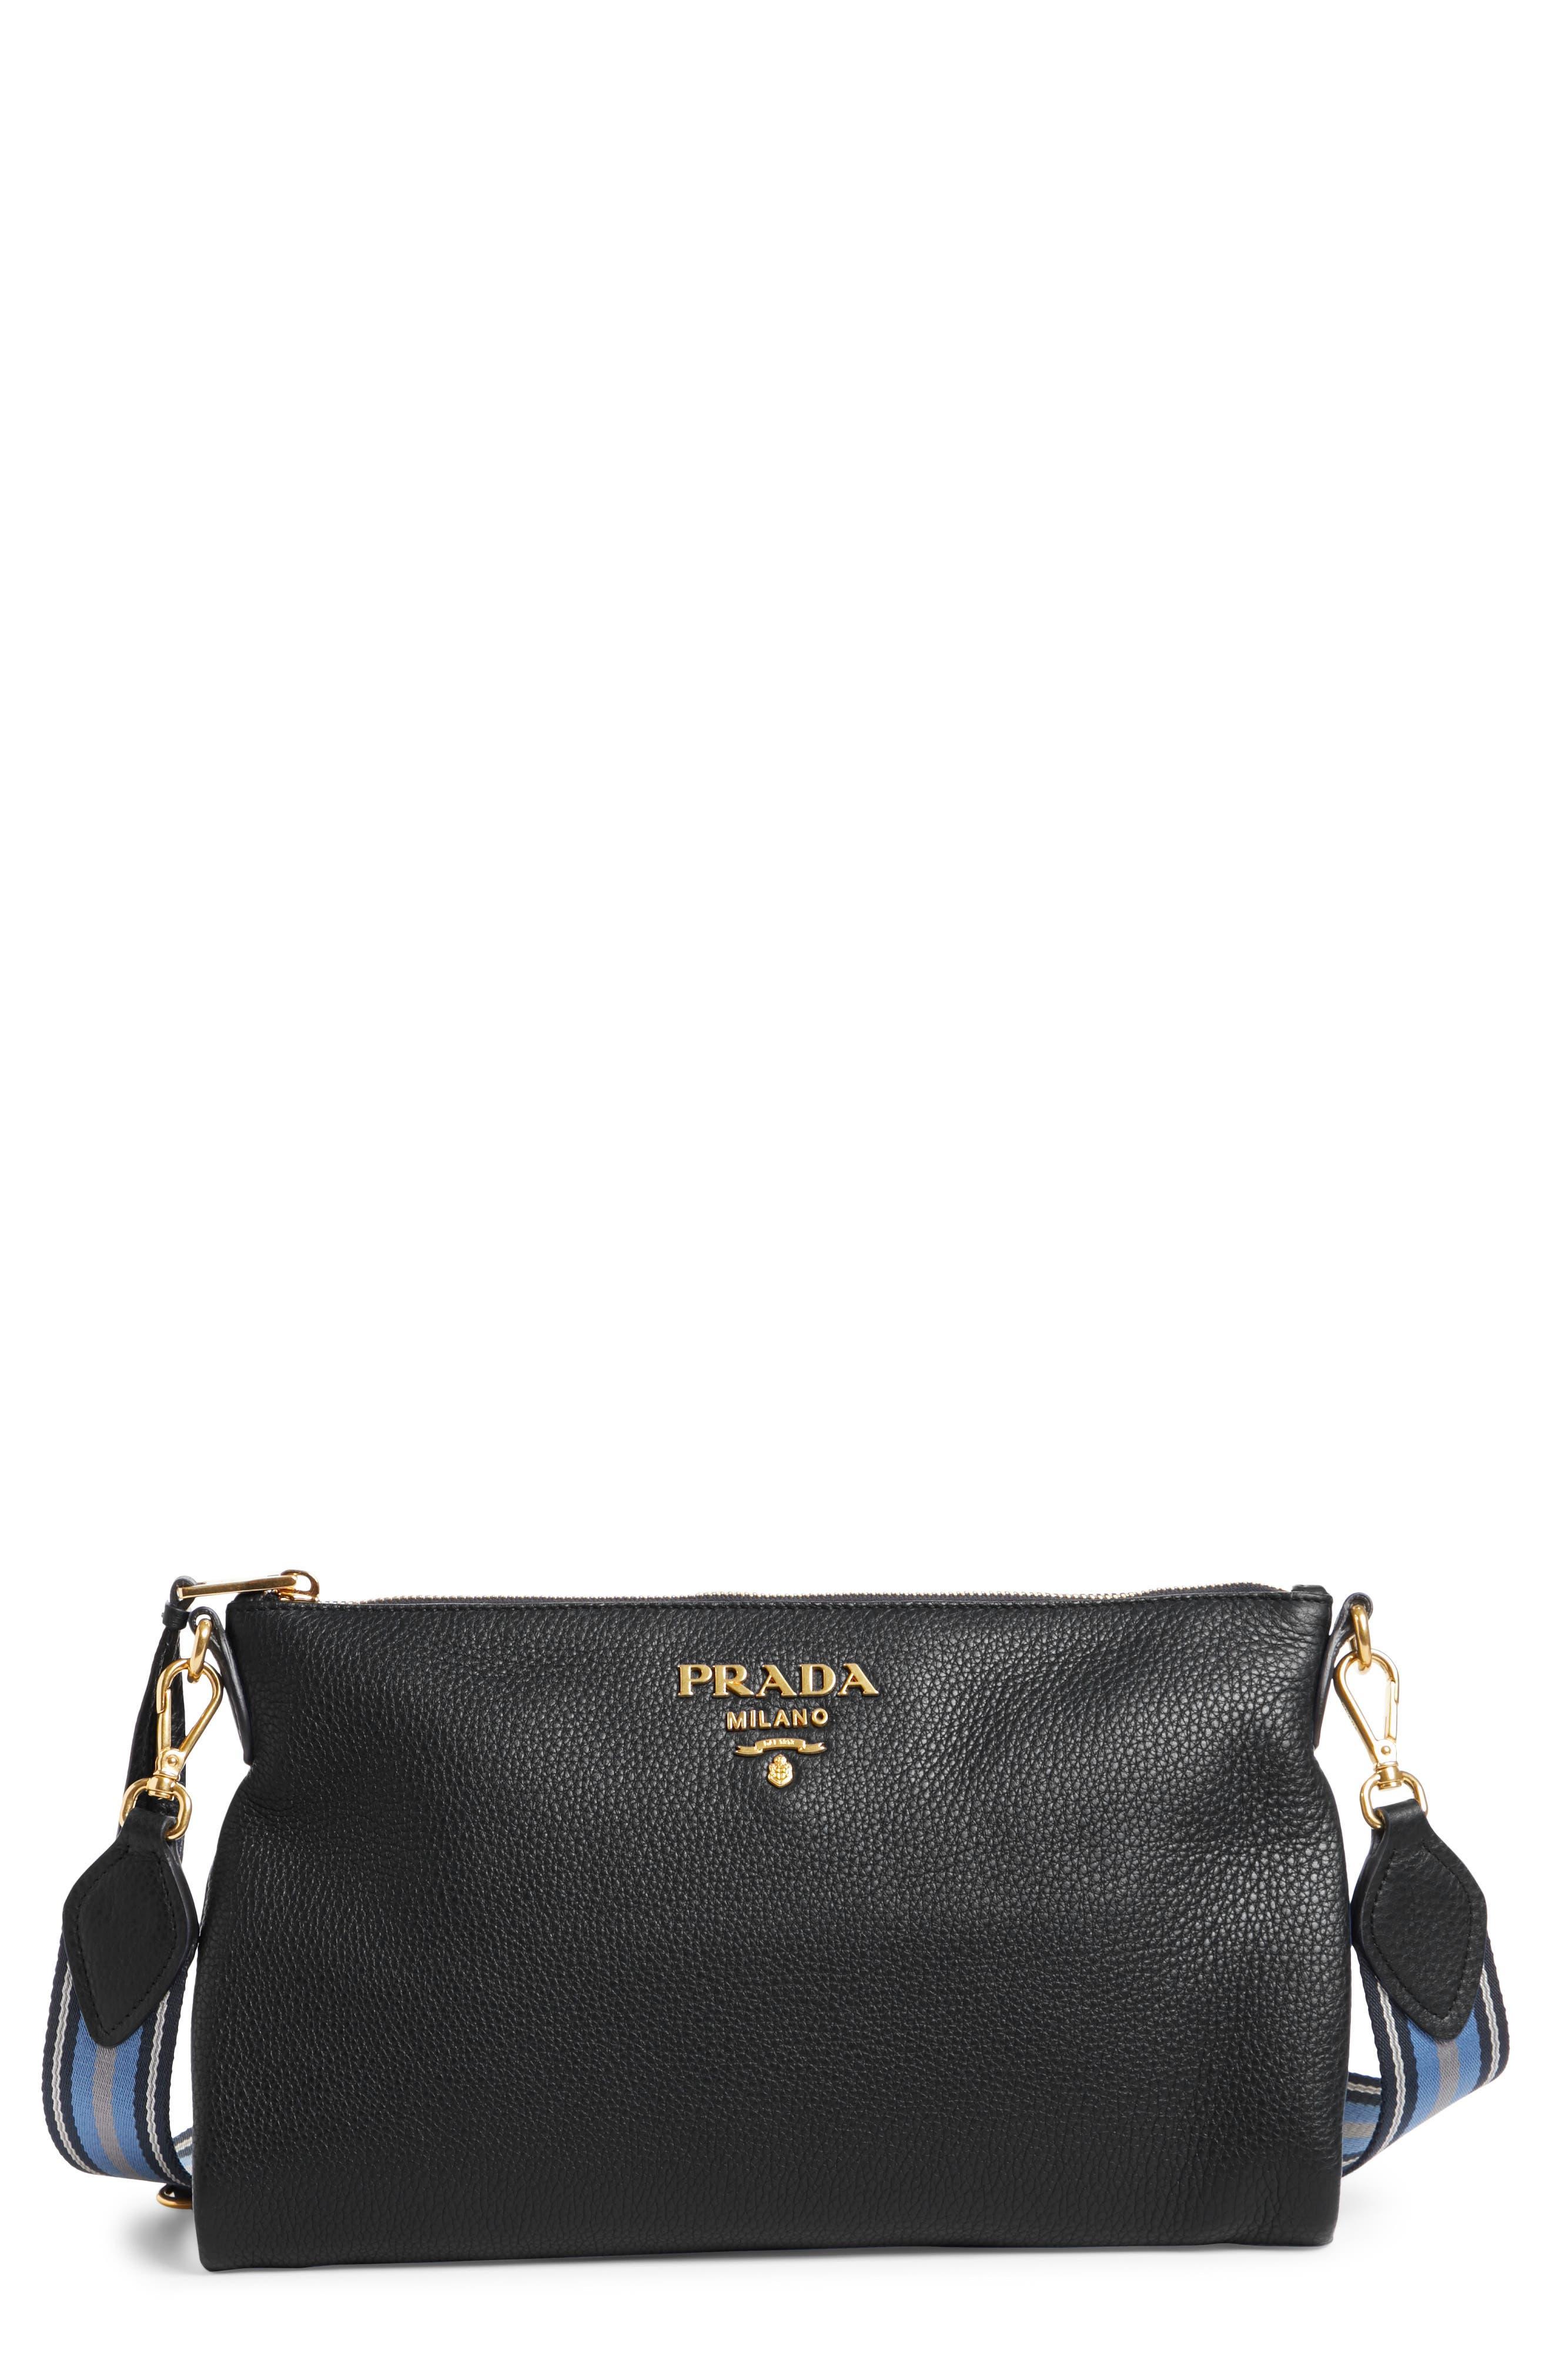 Prada Vitello Daino Leather Crossbody Bag